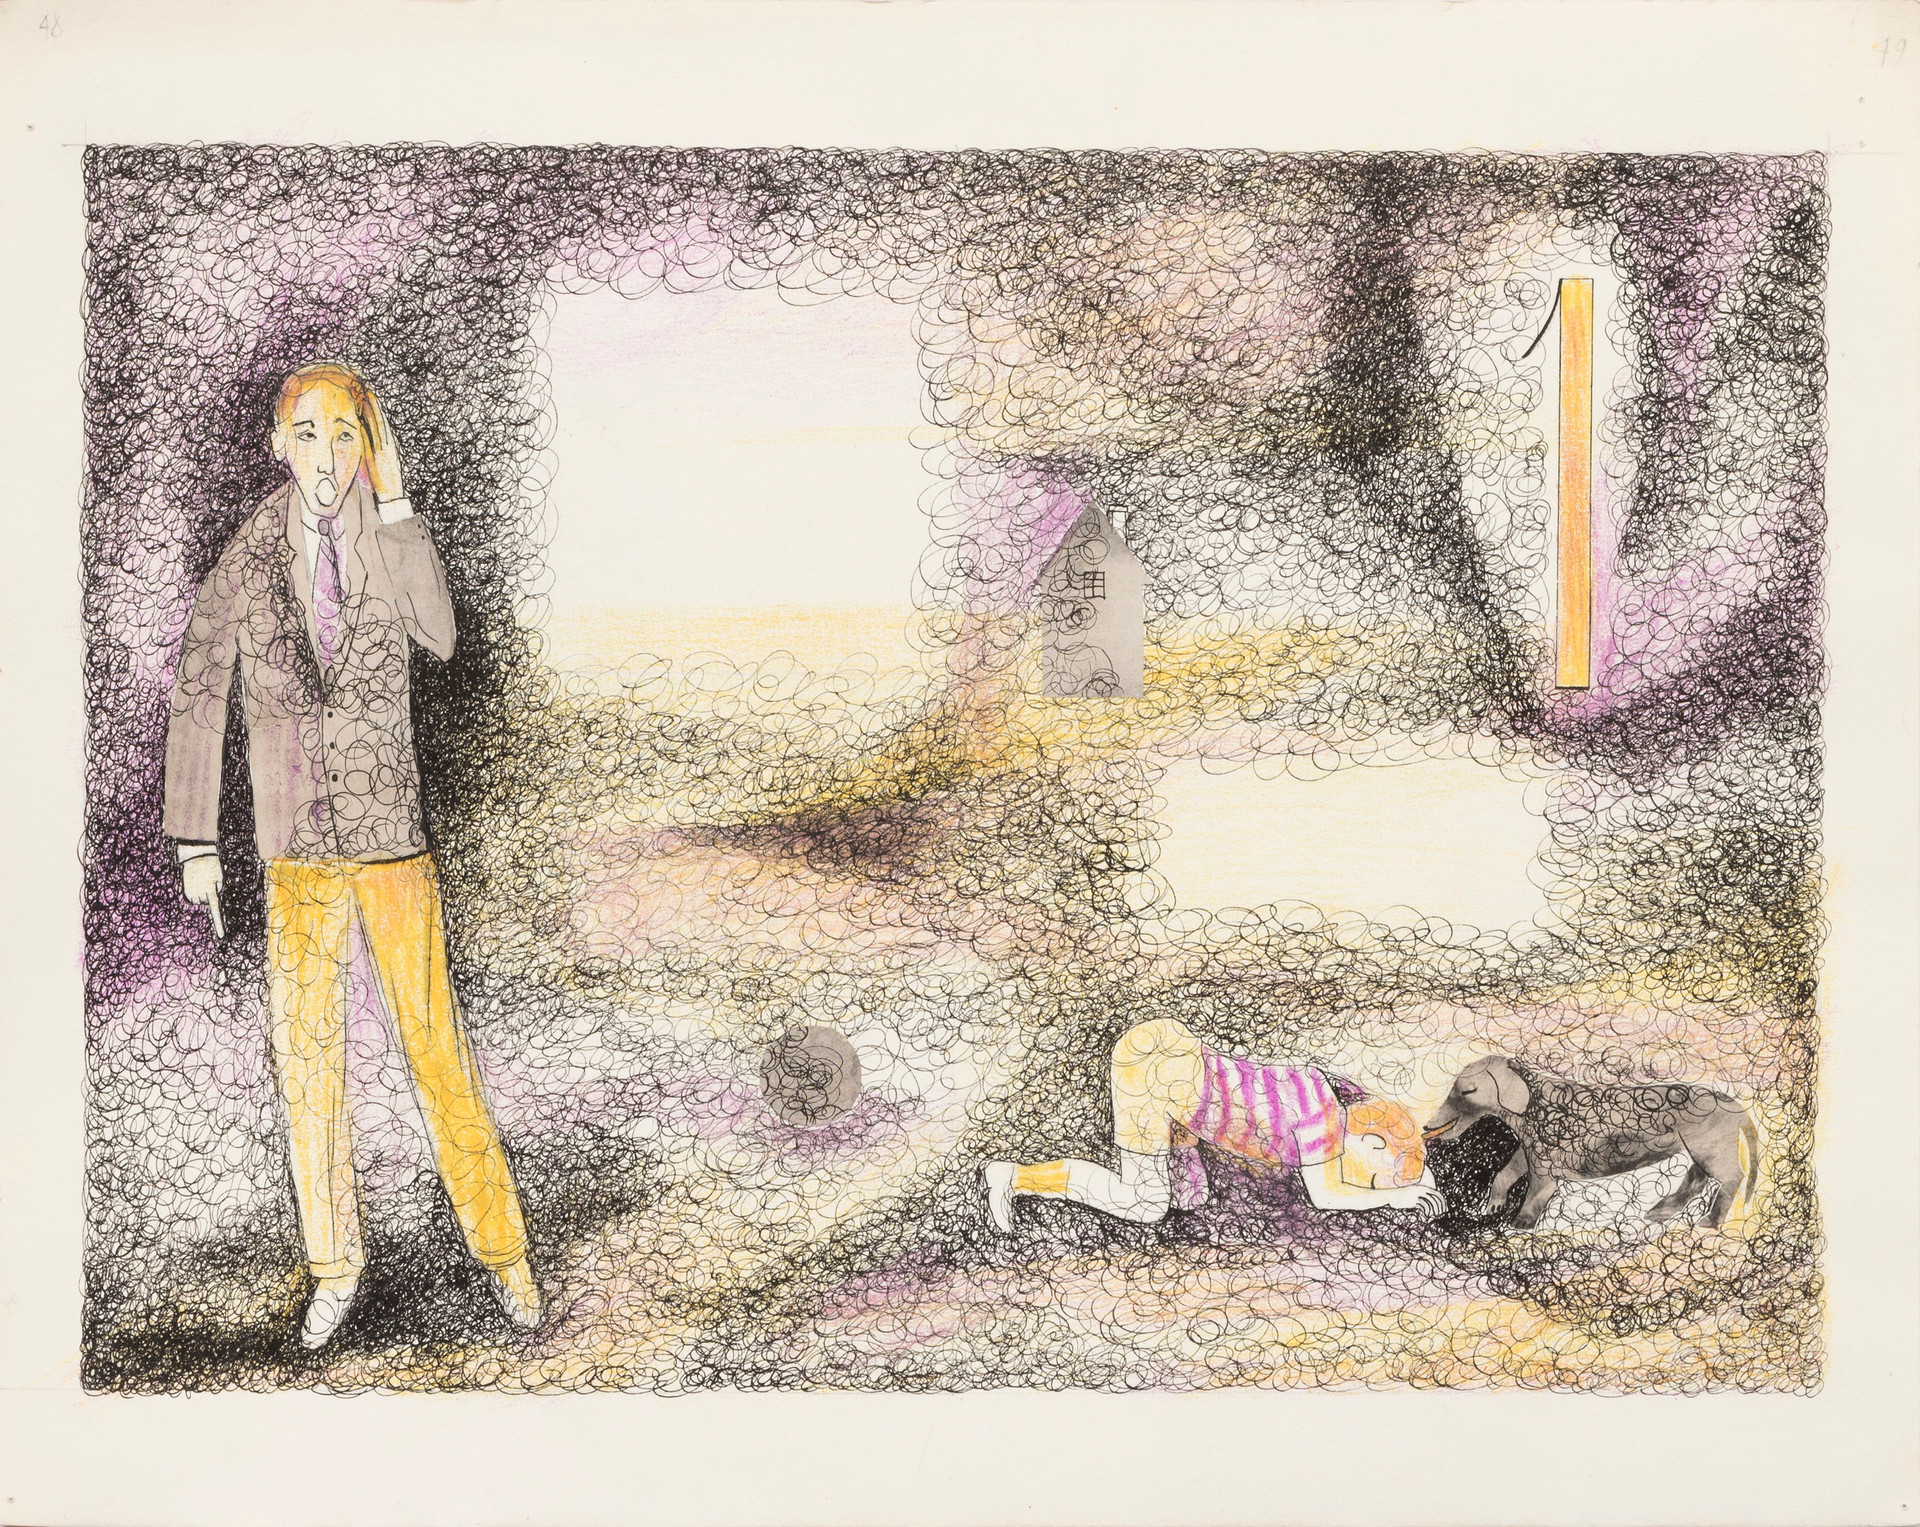 Untitled illustration page 48, 49 (boy and dog)